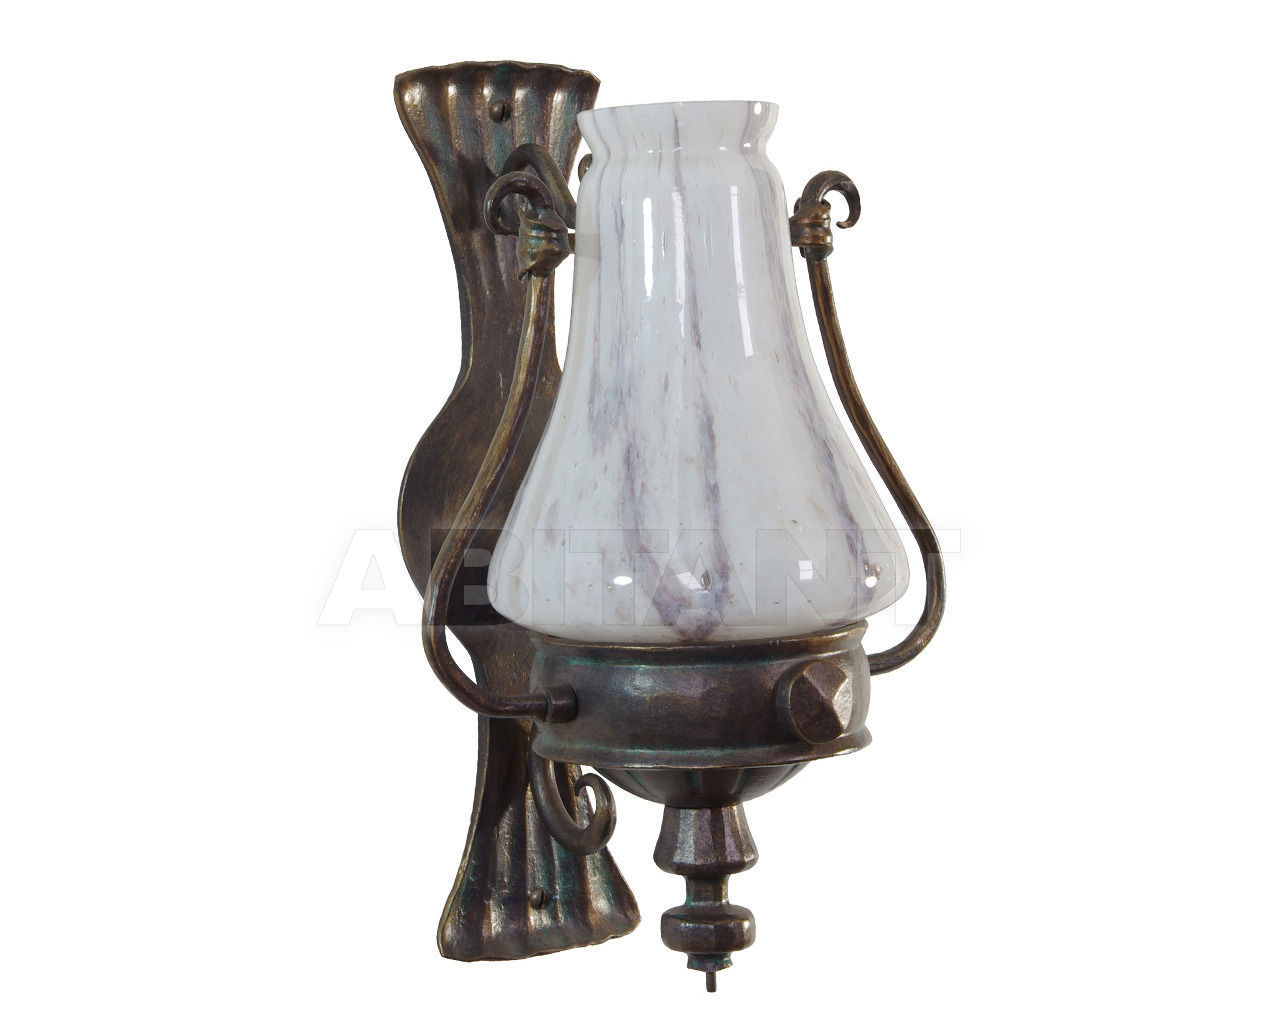 Купить Светильник настенный FMB Leuchten Schmiedeeisen Lampen Und Leuchten 94071